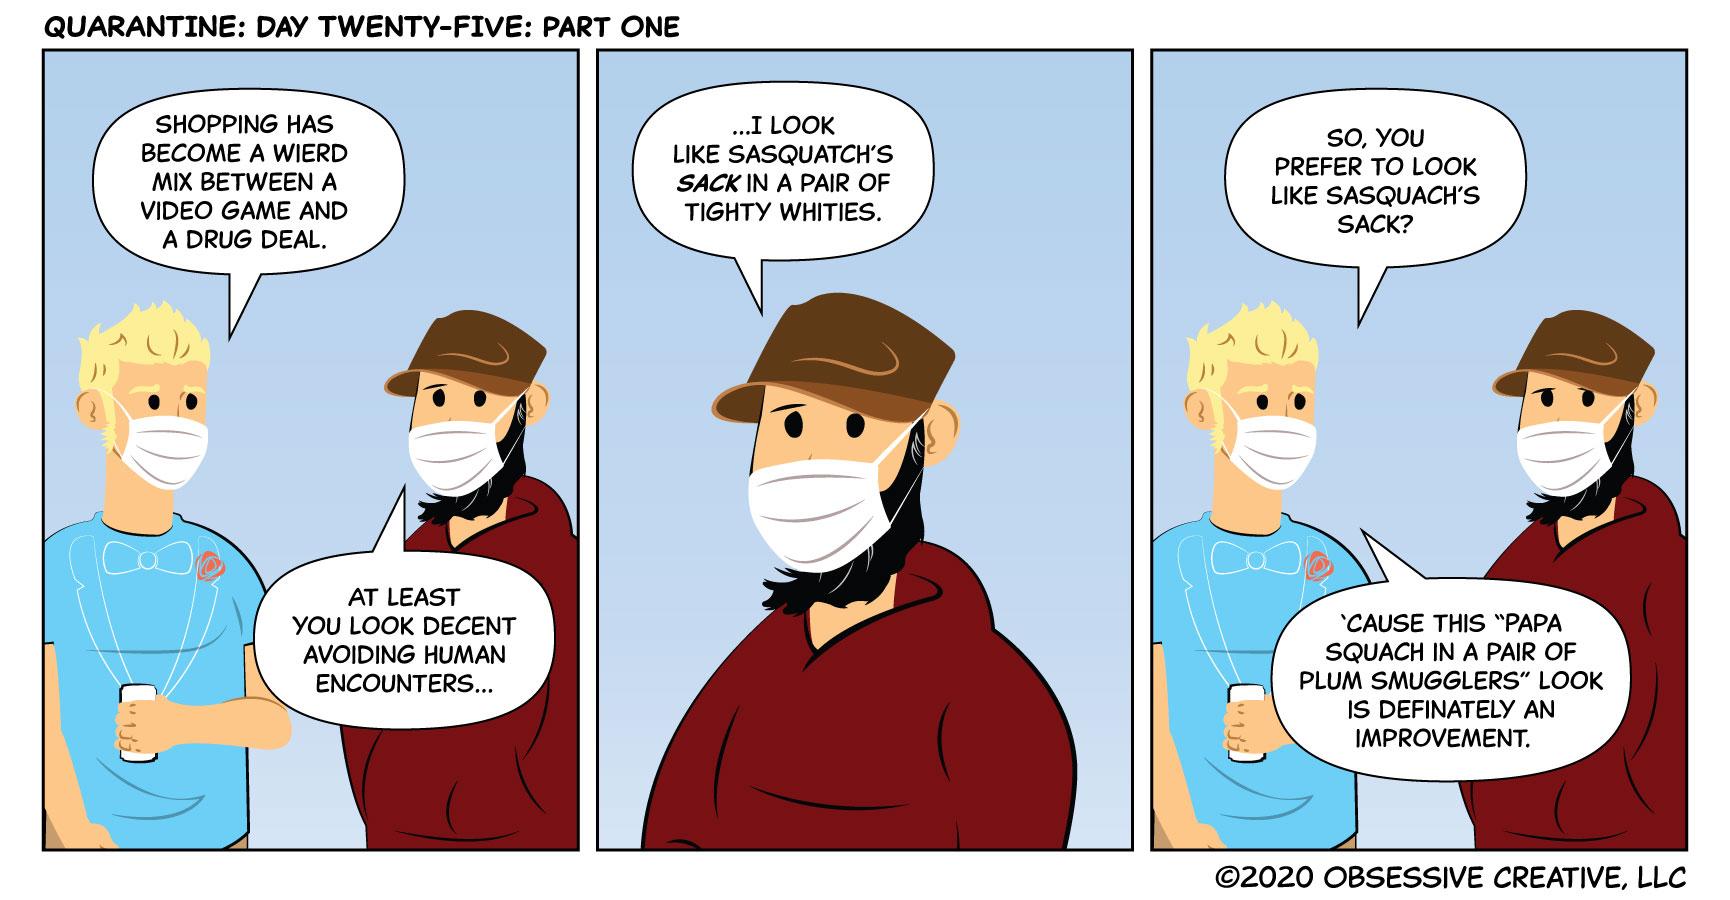 QUARANTINE: Day Twenty-Five: Part One